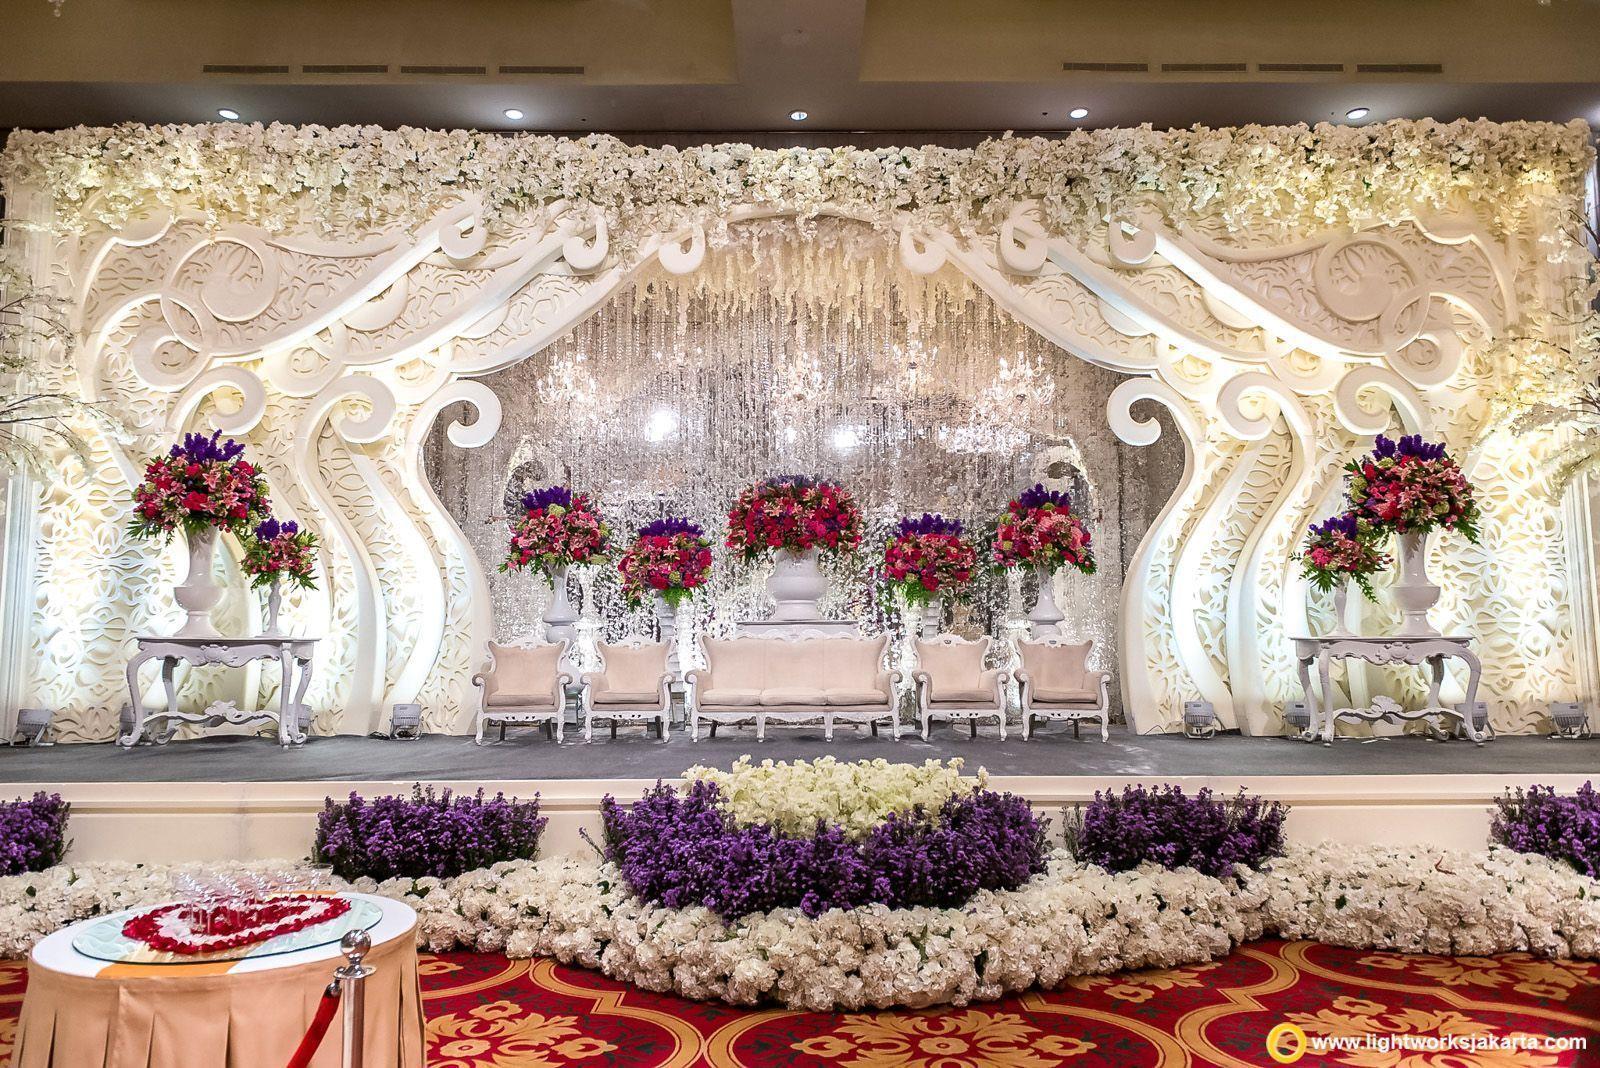 Wedding stage decor ideas  Stunning stage decor ideas  Indian wedding stage decor ideas